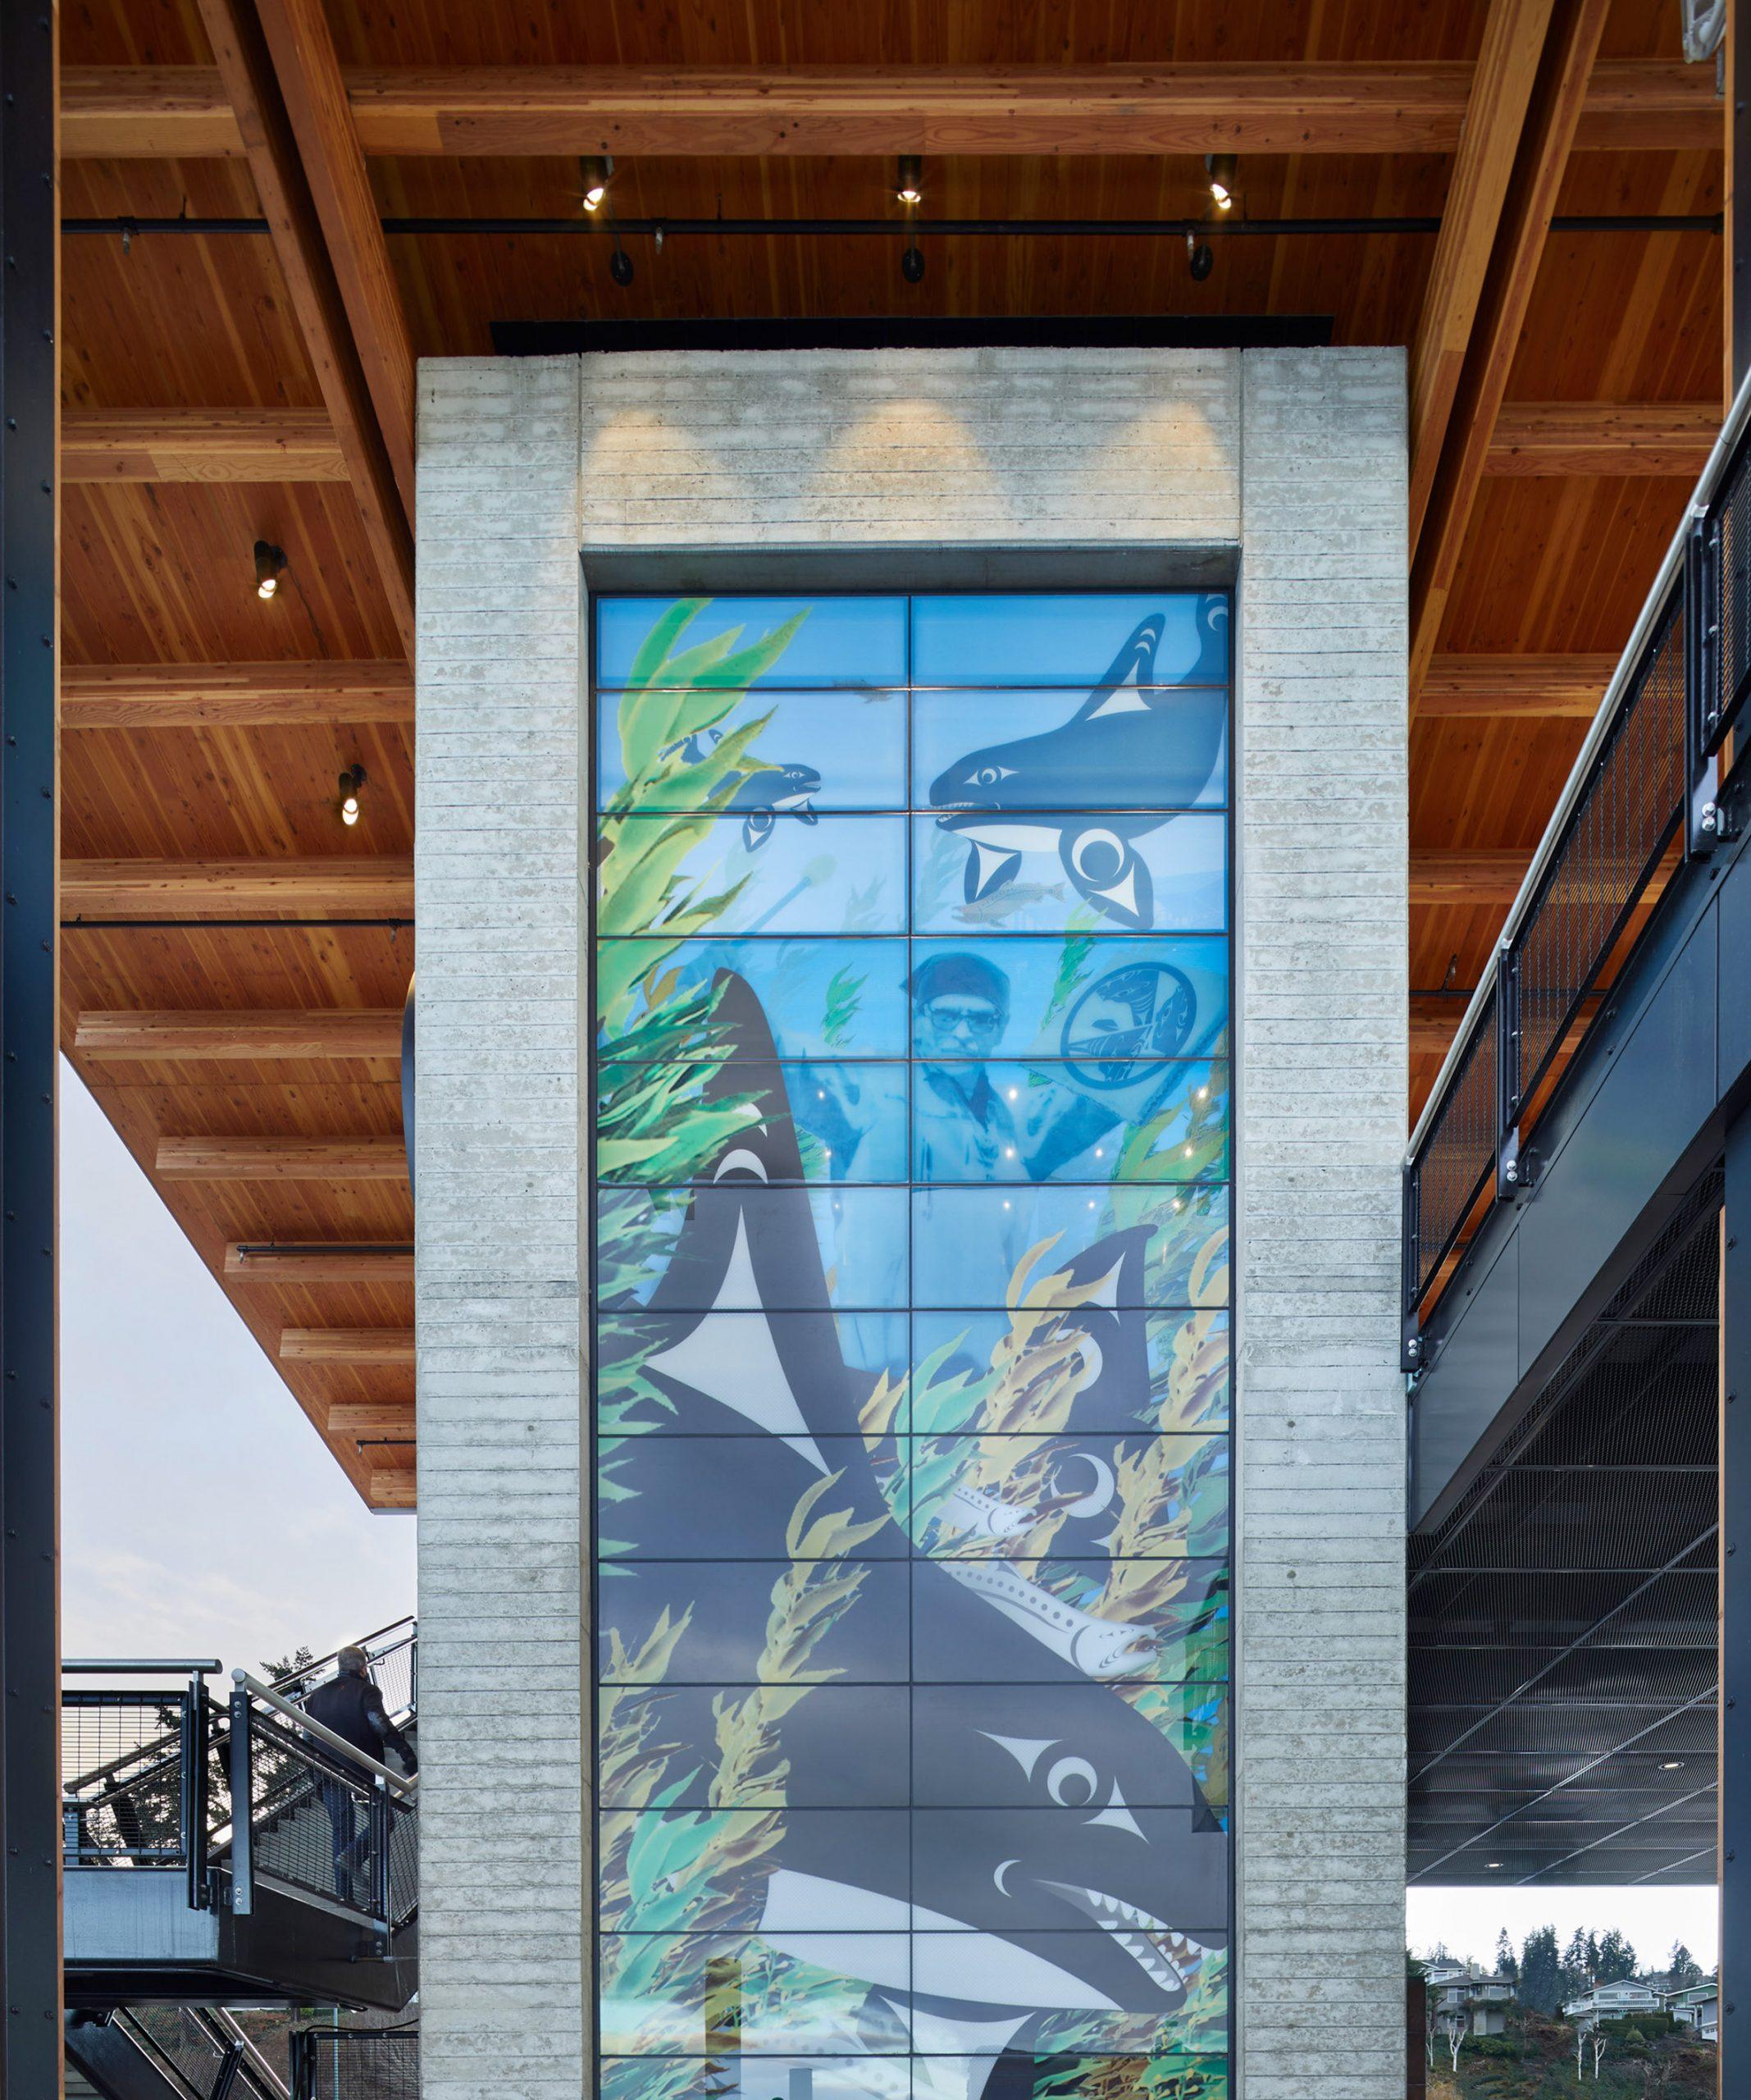 Glass mural on elevator shaft